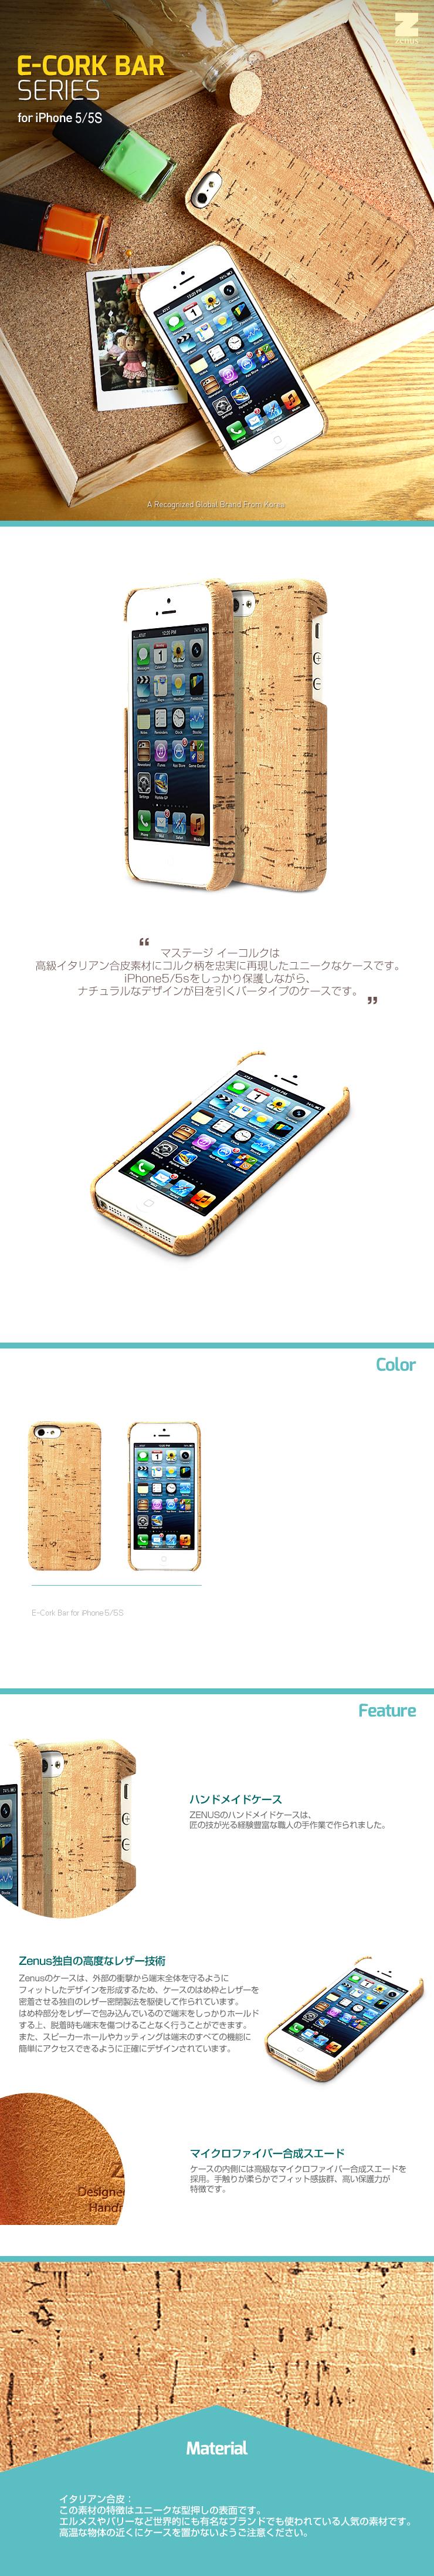 【iPhone5S/5】ZENUS Masstige E-Cork Bar (マステージ イーコルクバー)